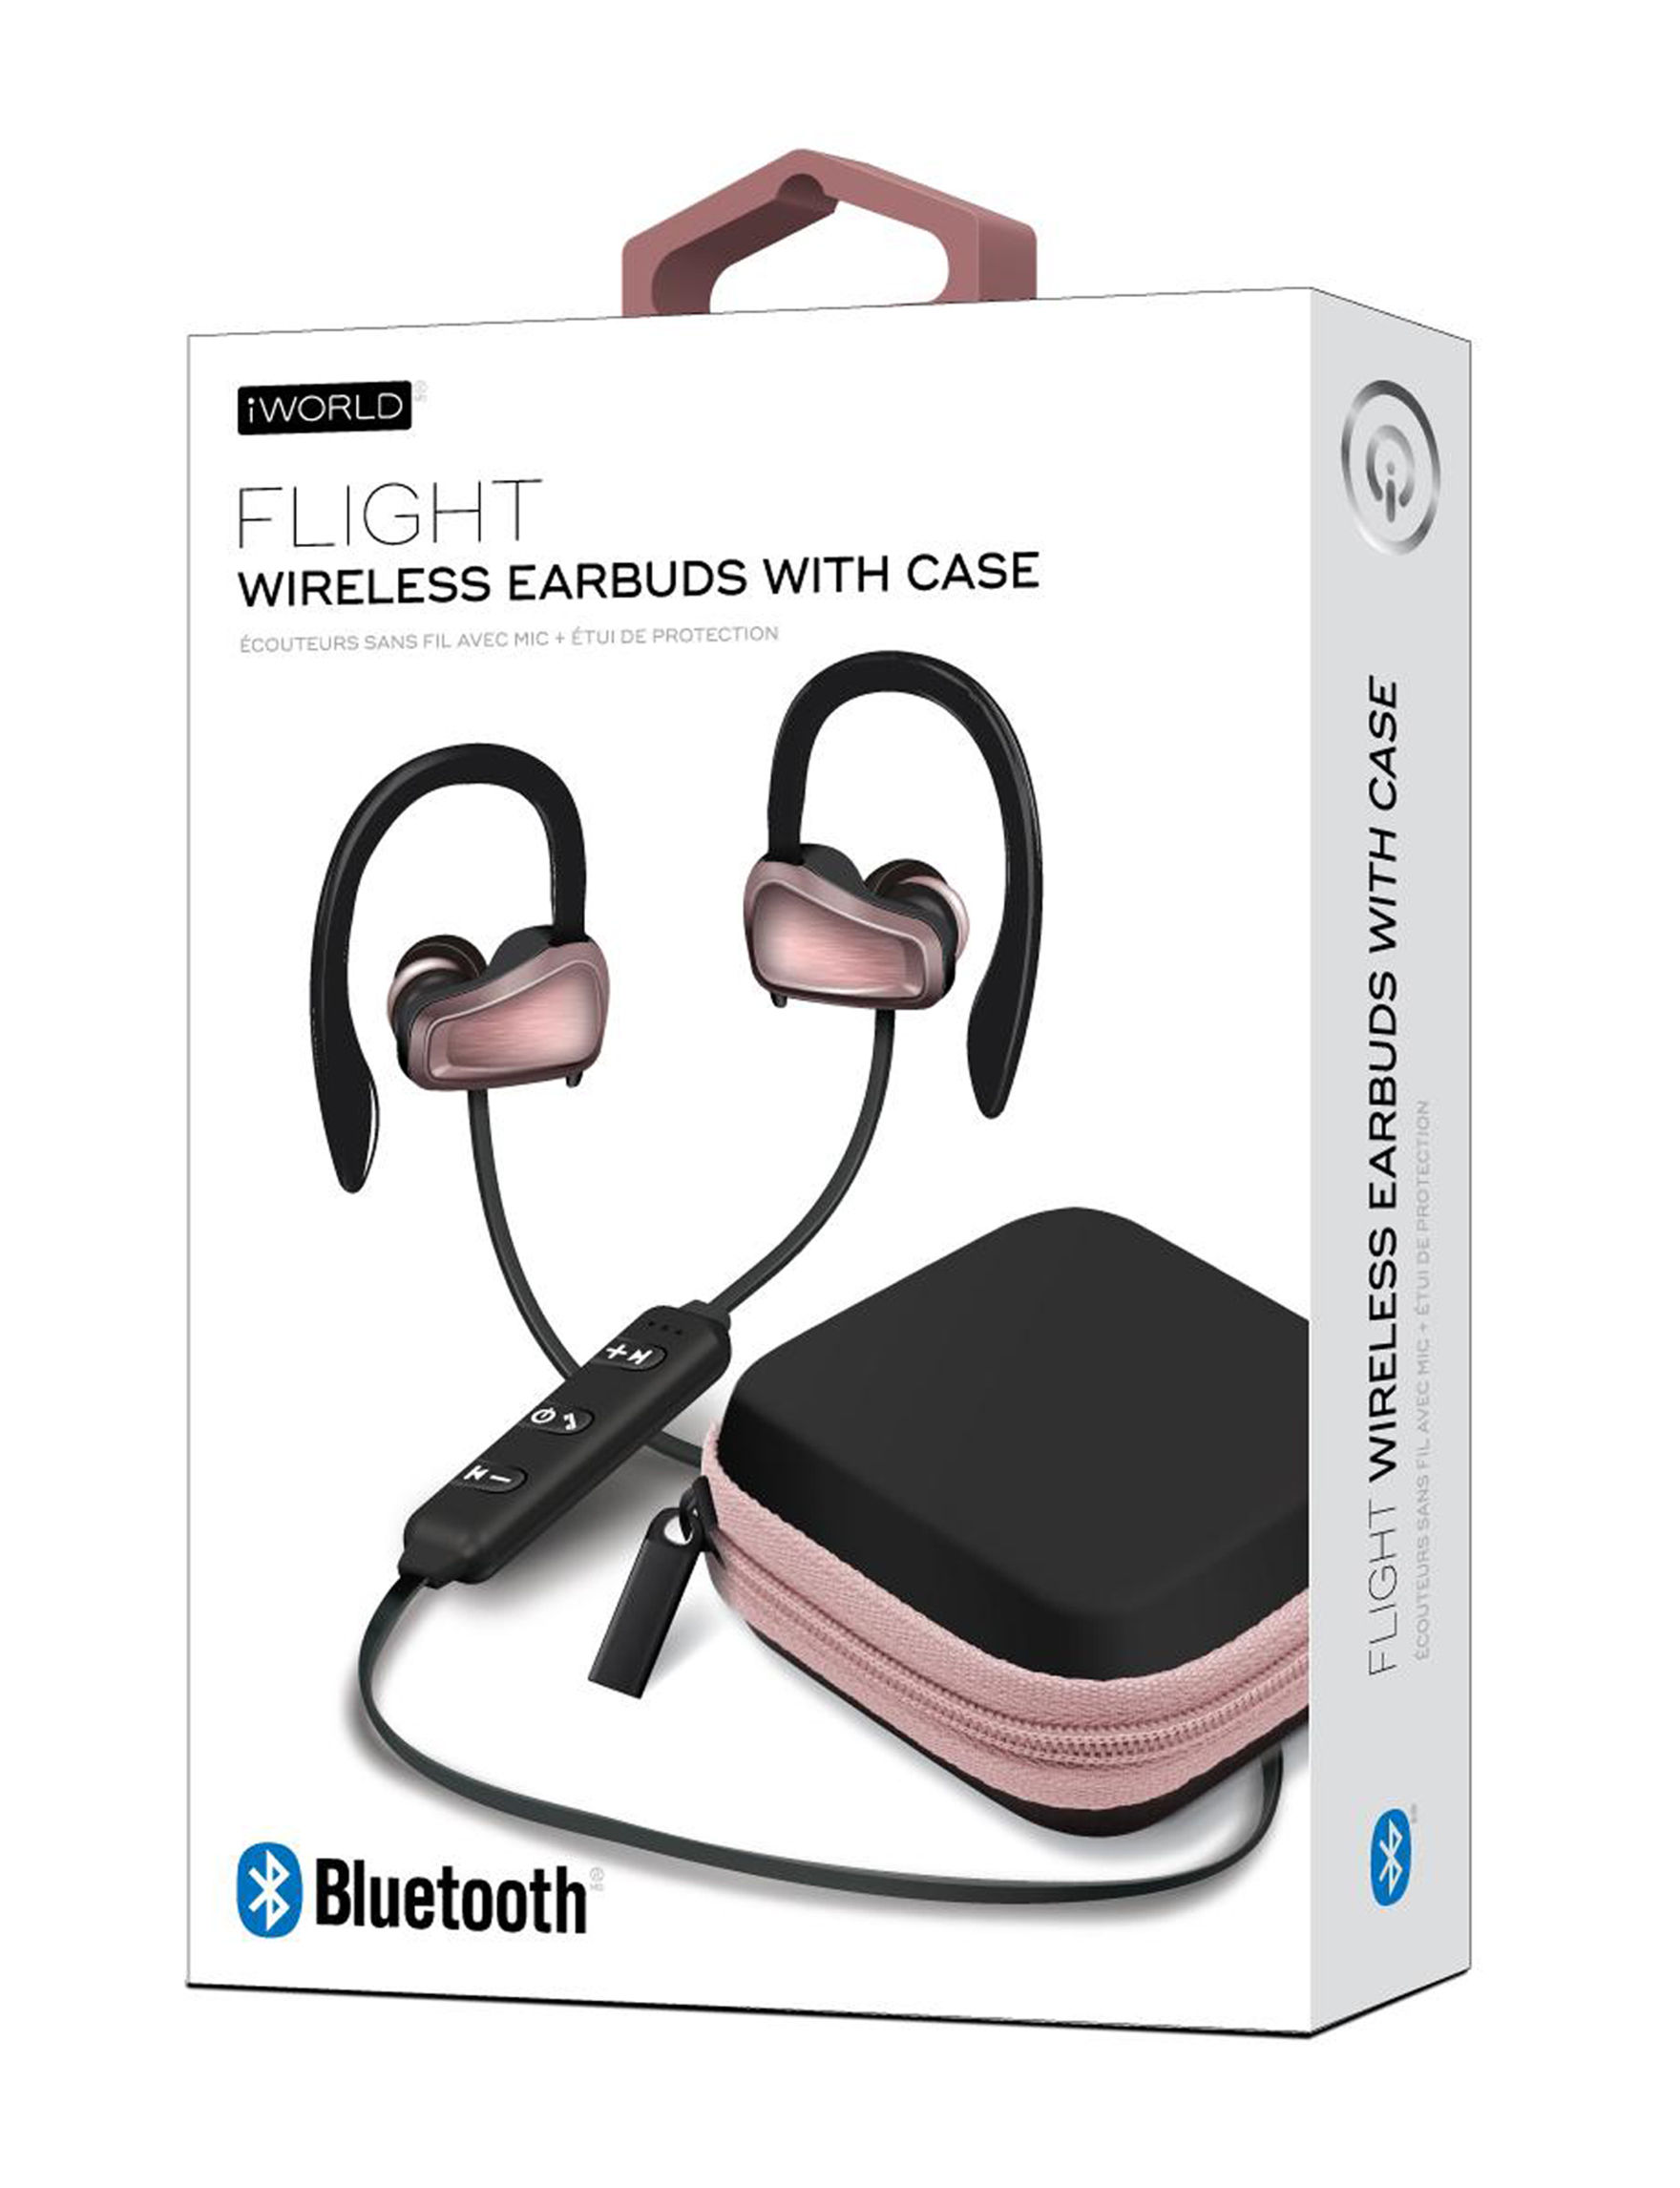 iWorld Rose Gold / Black Headphones Tech Accessories